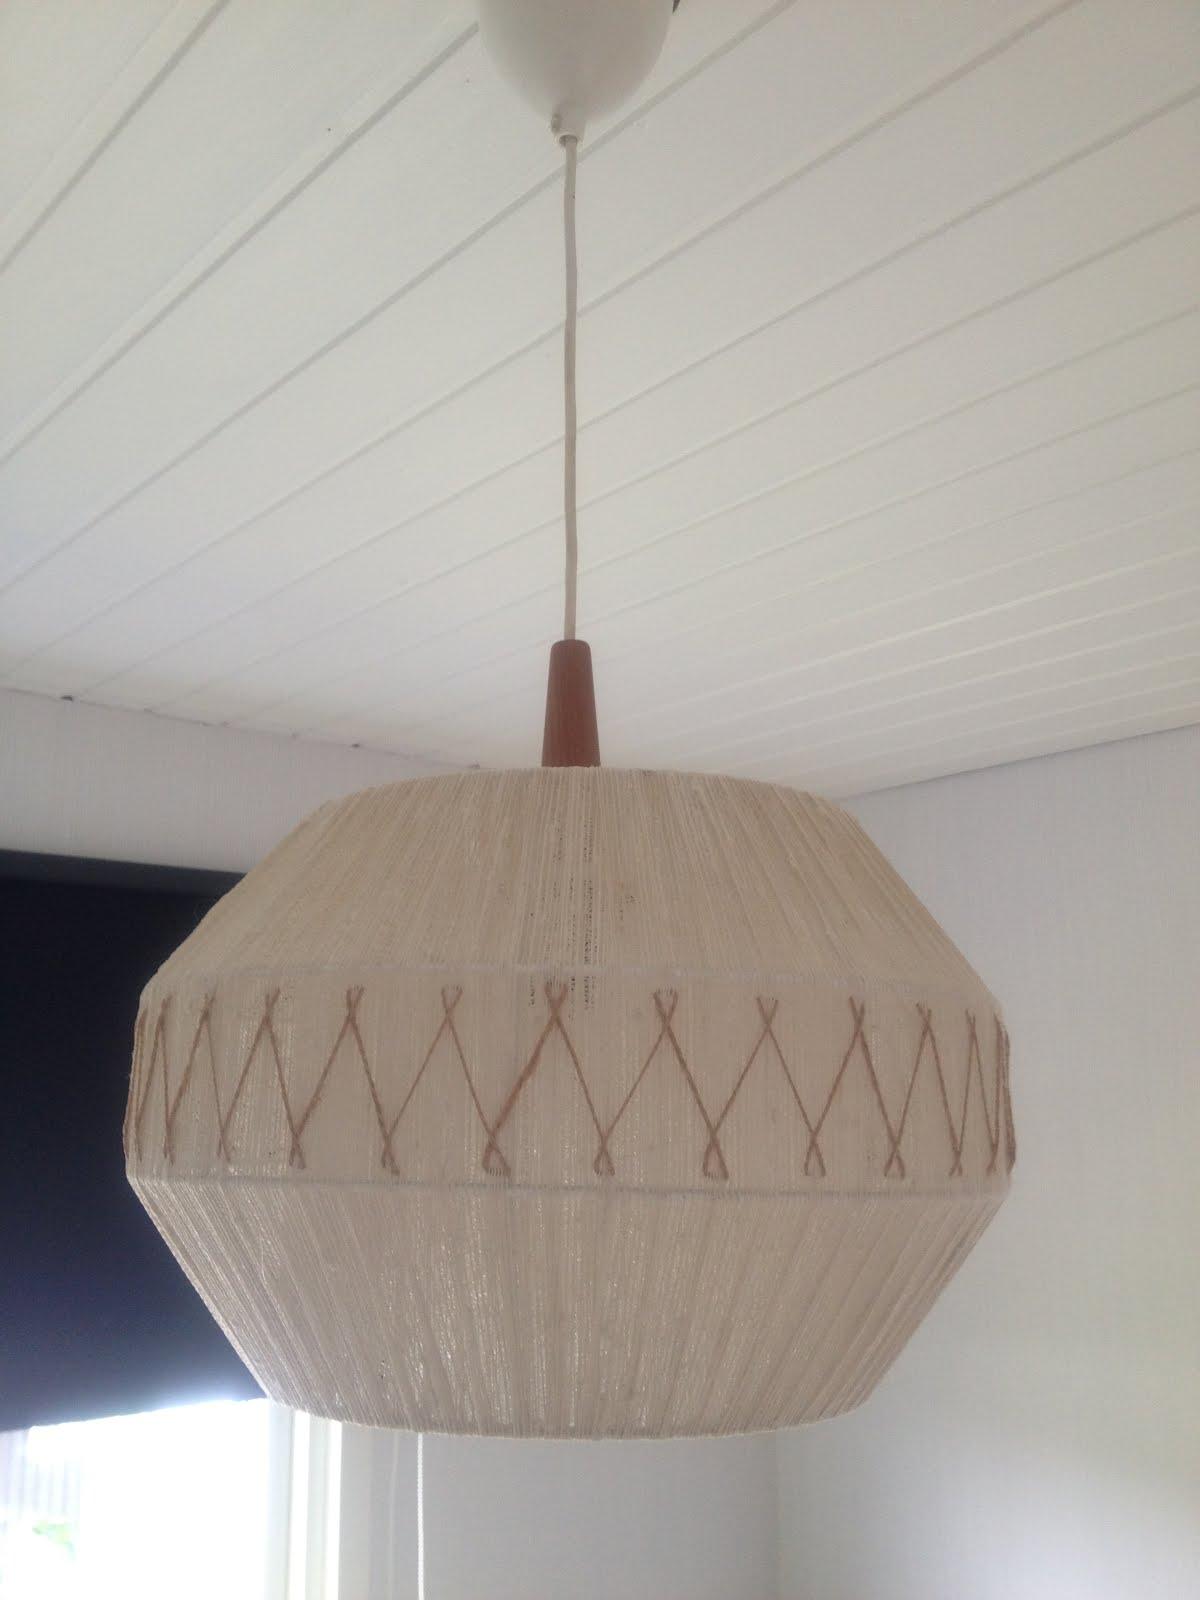 50 Tals Lampa Affordable Stort Tygstycke Gardin Draperi Eller Tal Art Design With 50 Tals Lampa